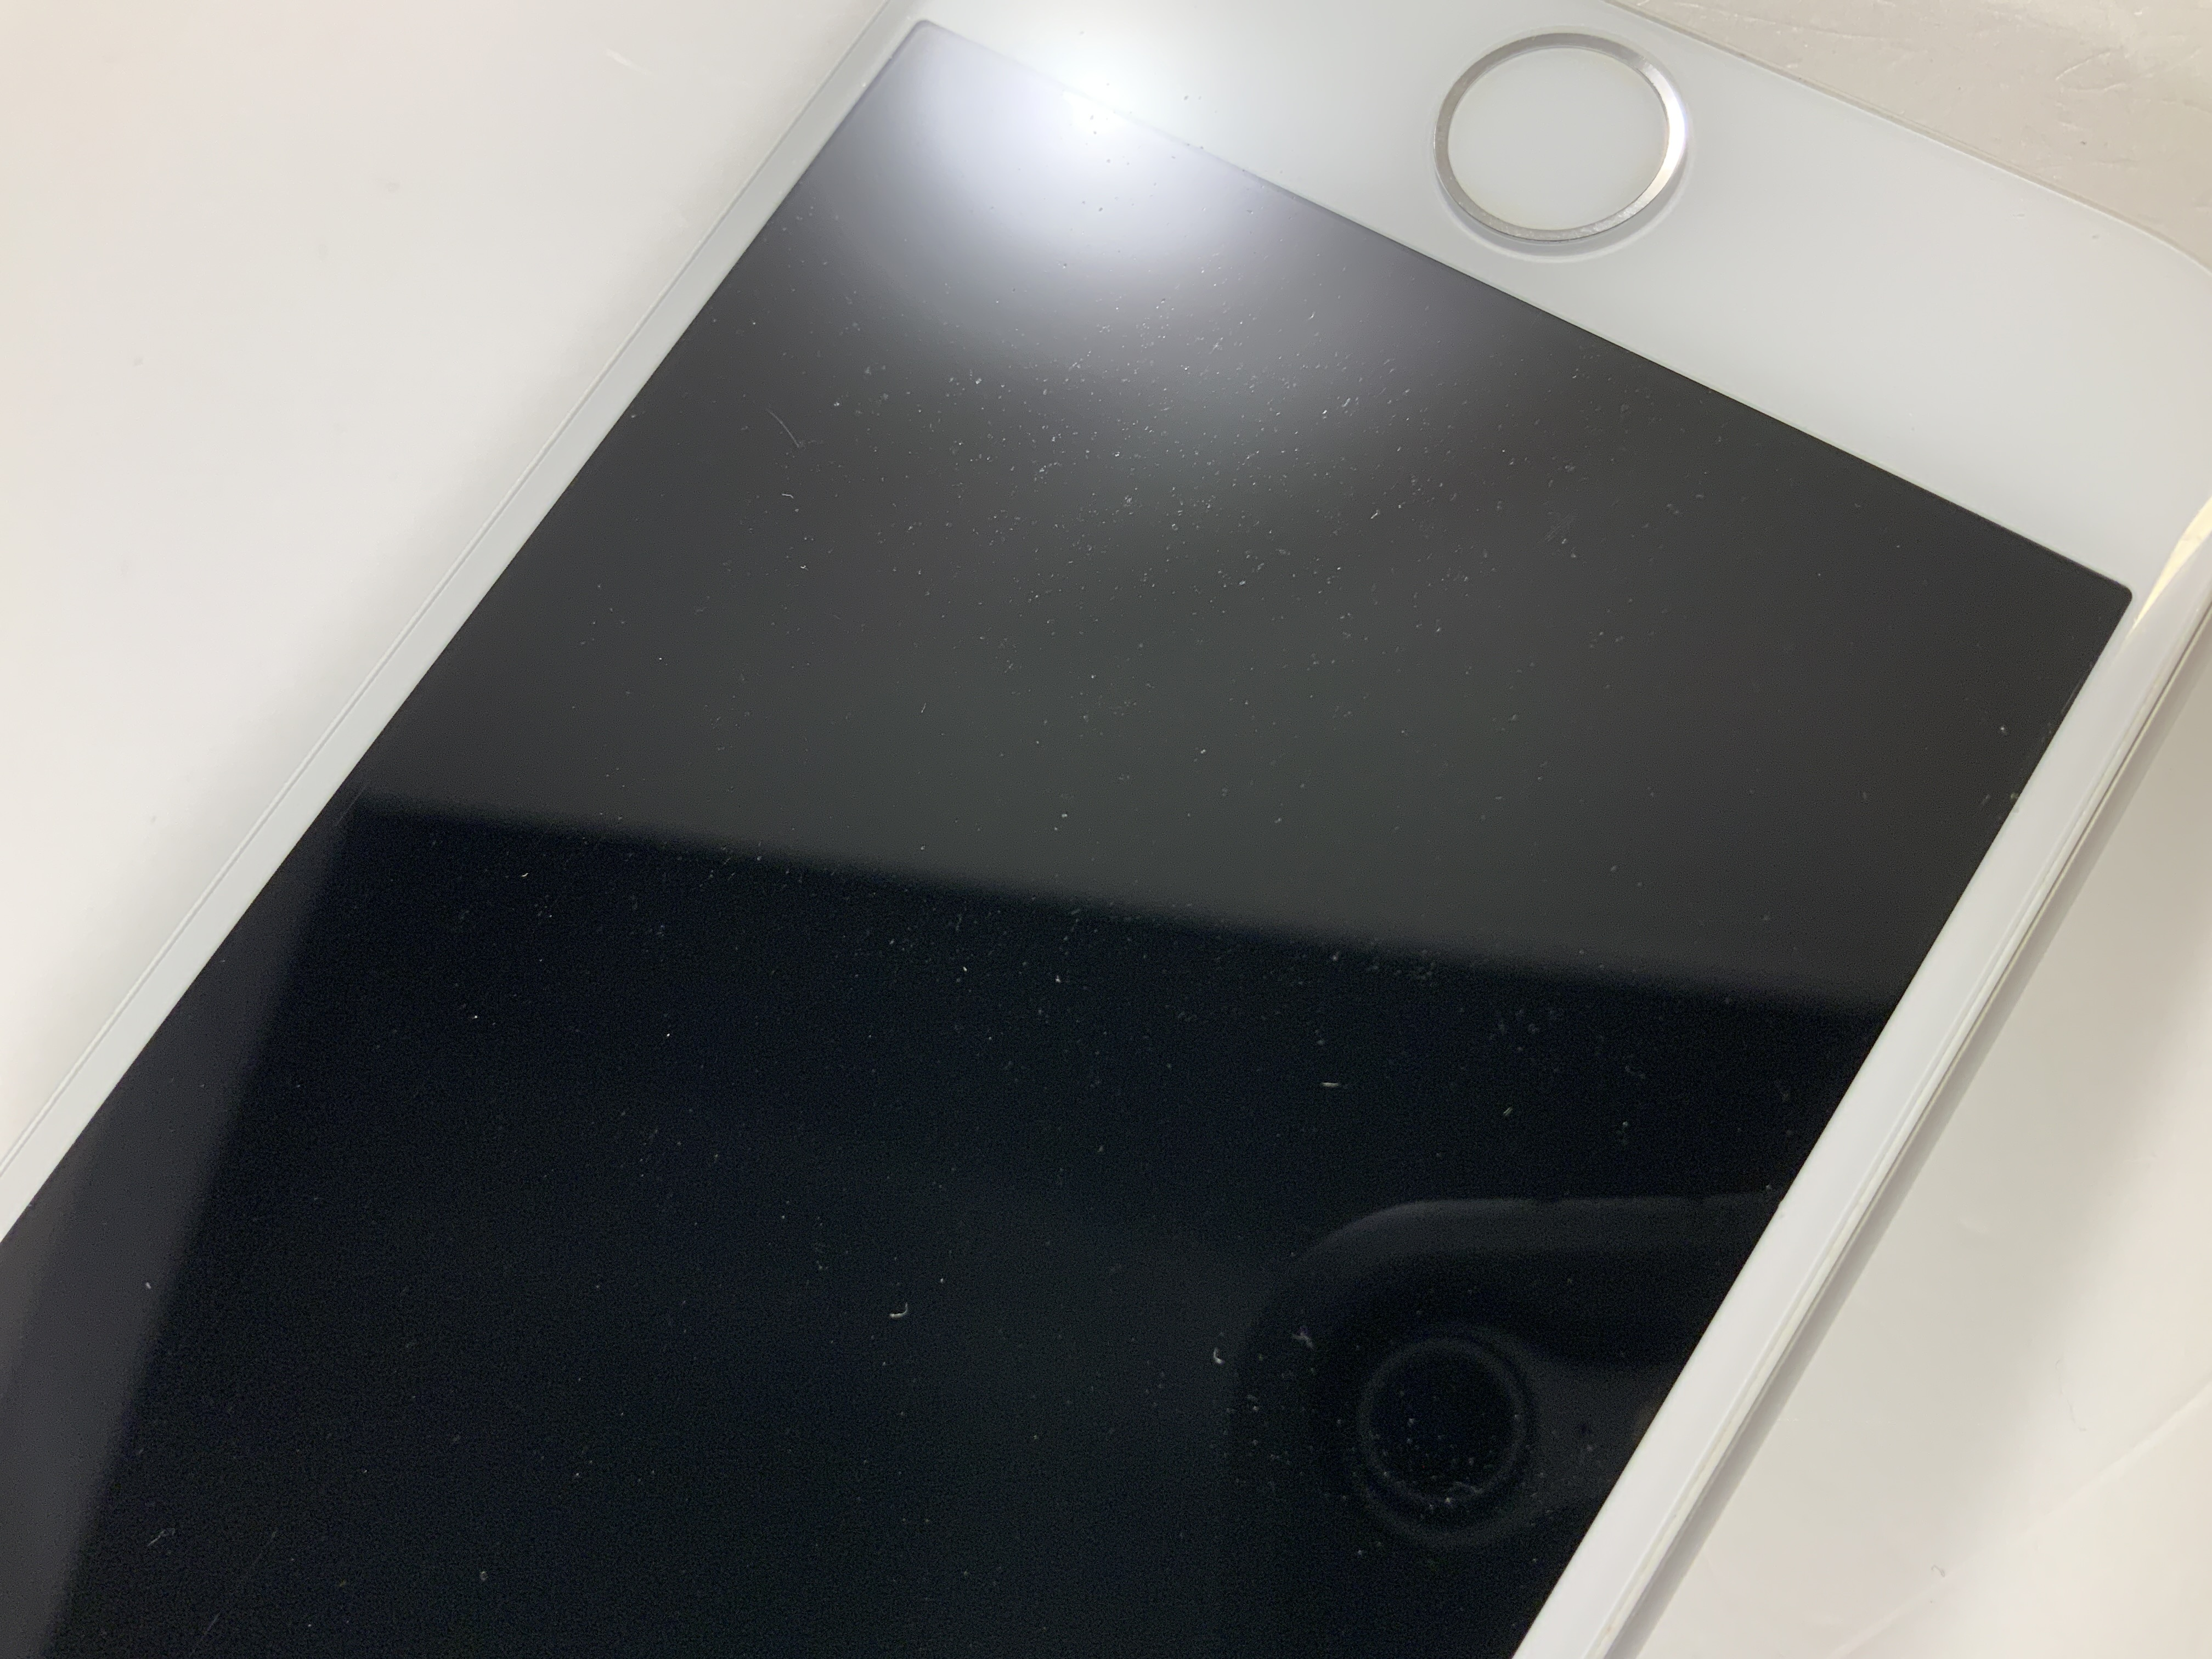 iPhone 7 32GB, 32GB, Silver, immagine 4